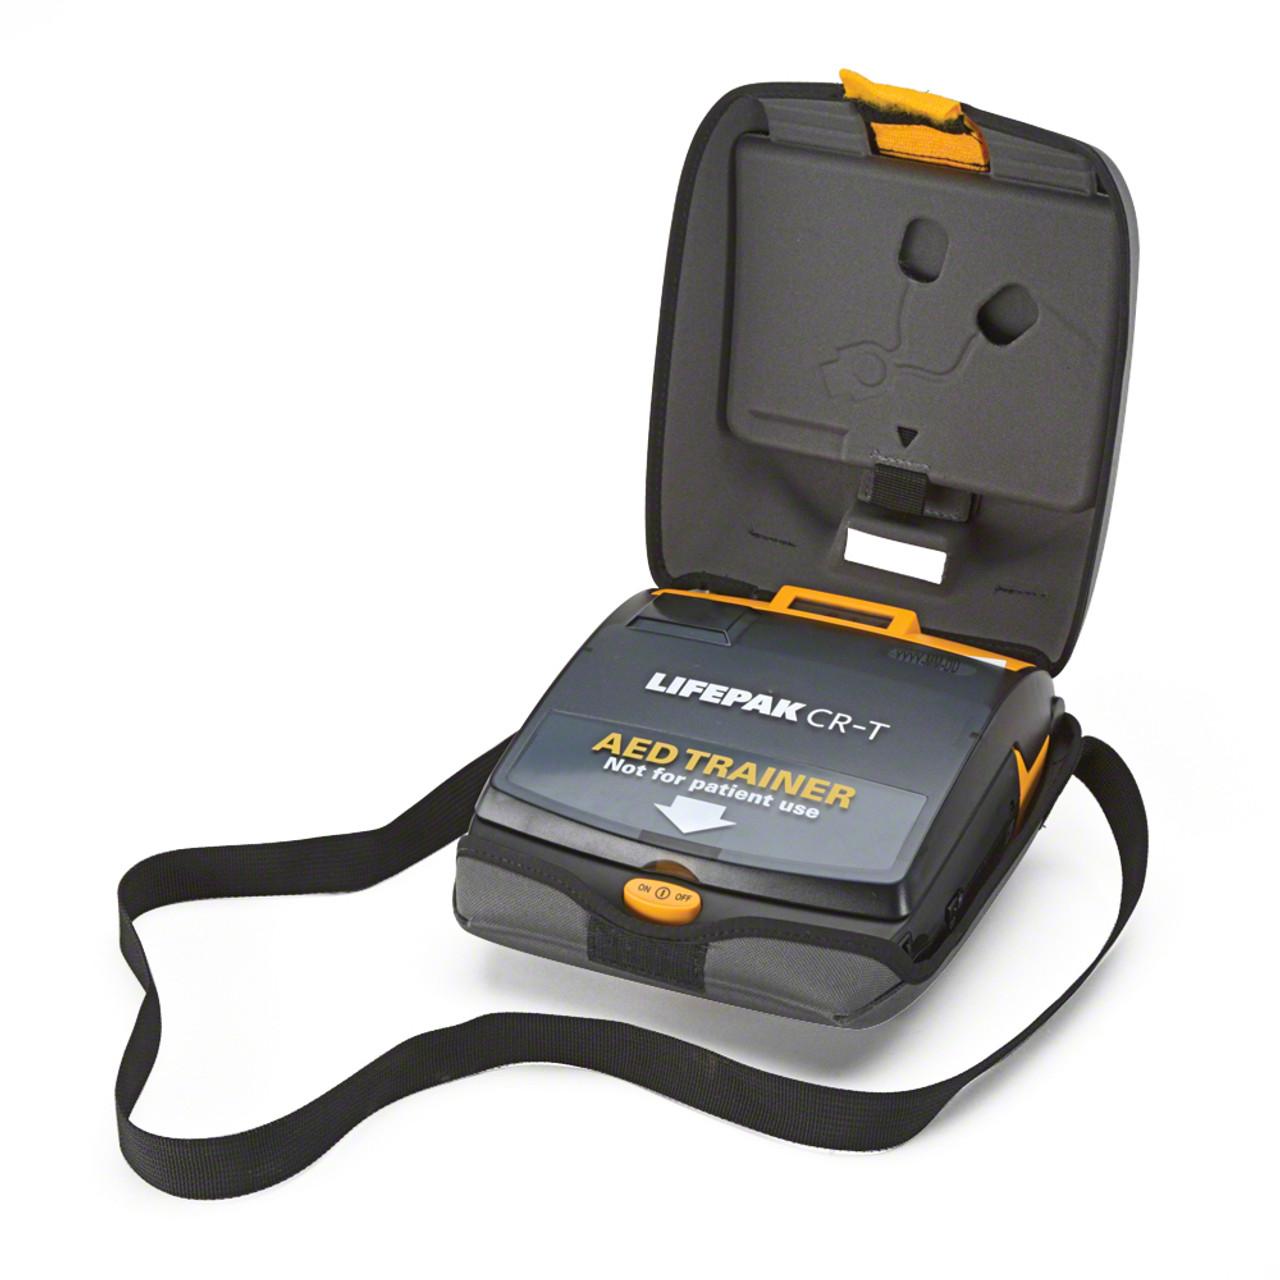 Physio-Control LIFEPAK CR+ AED Trainer